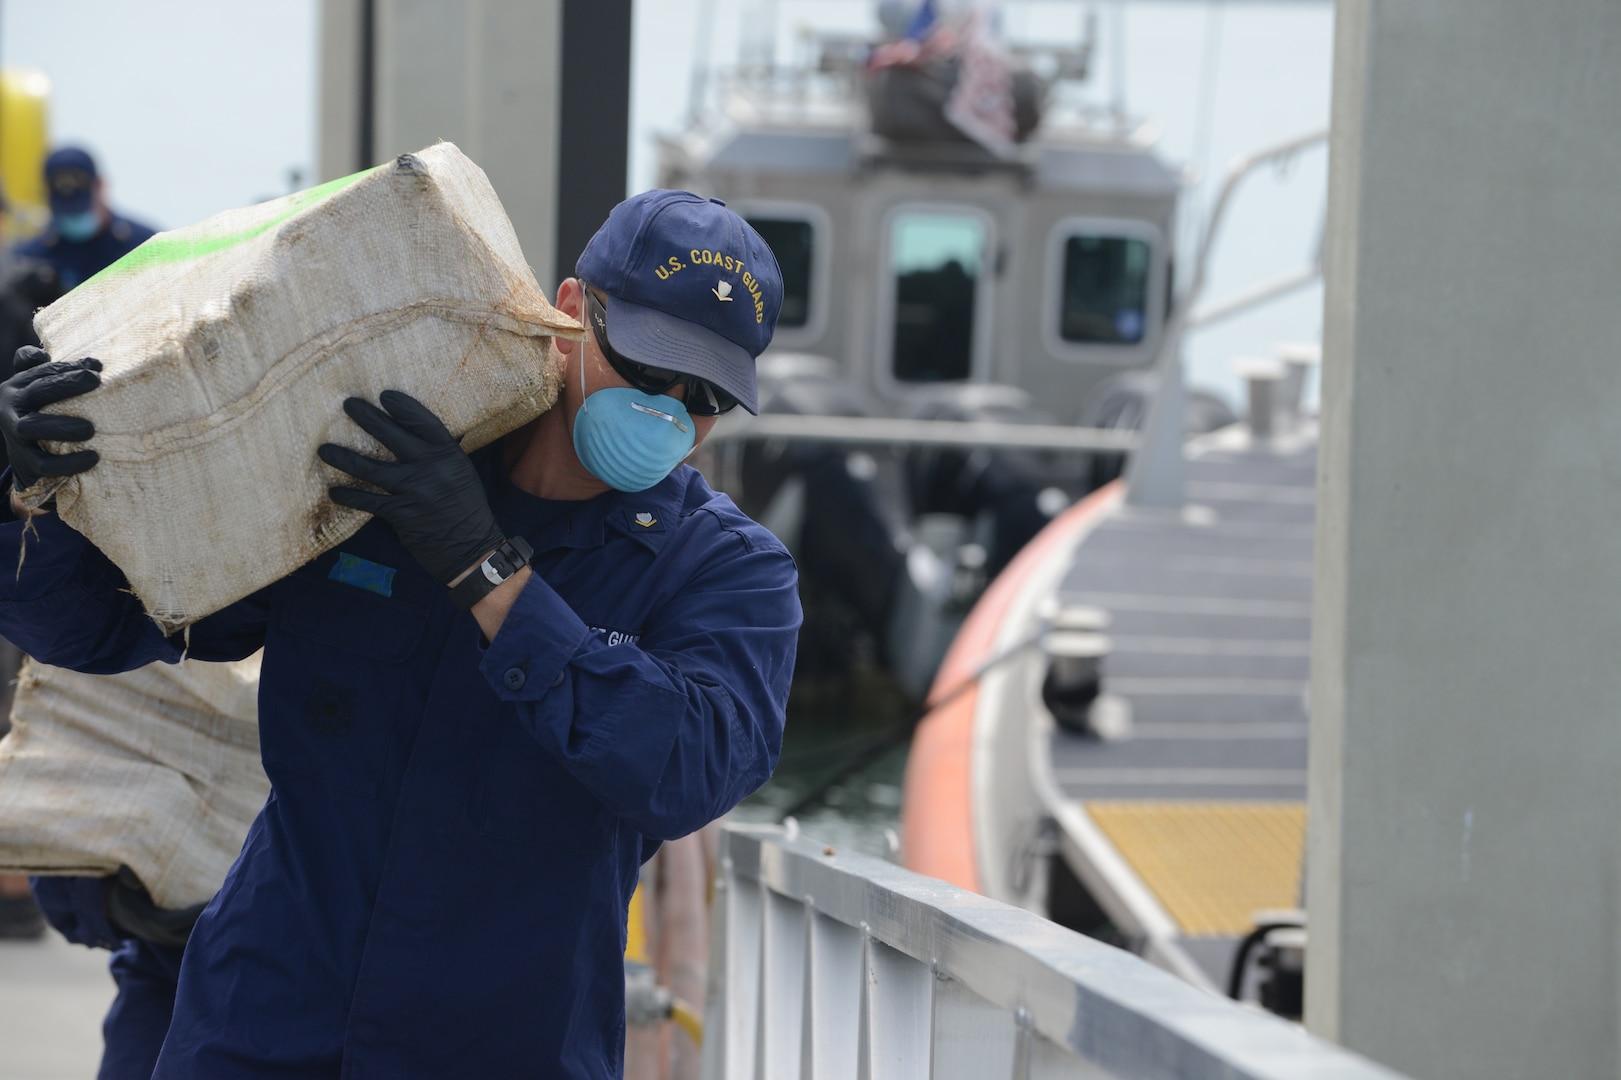 U.S. Coastguardsman offloads cocaine at Coast Guard Station Miami Beach, Florida, September 18, 2014 (U.S. Coast Guard/Jon-Paul Rios)